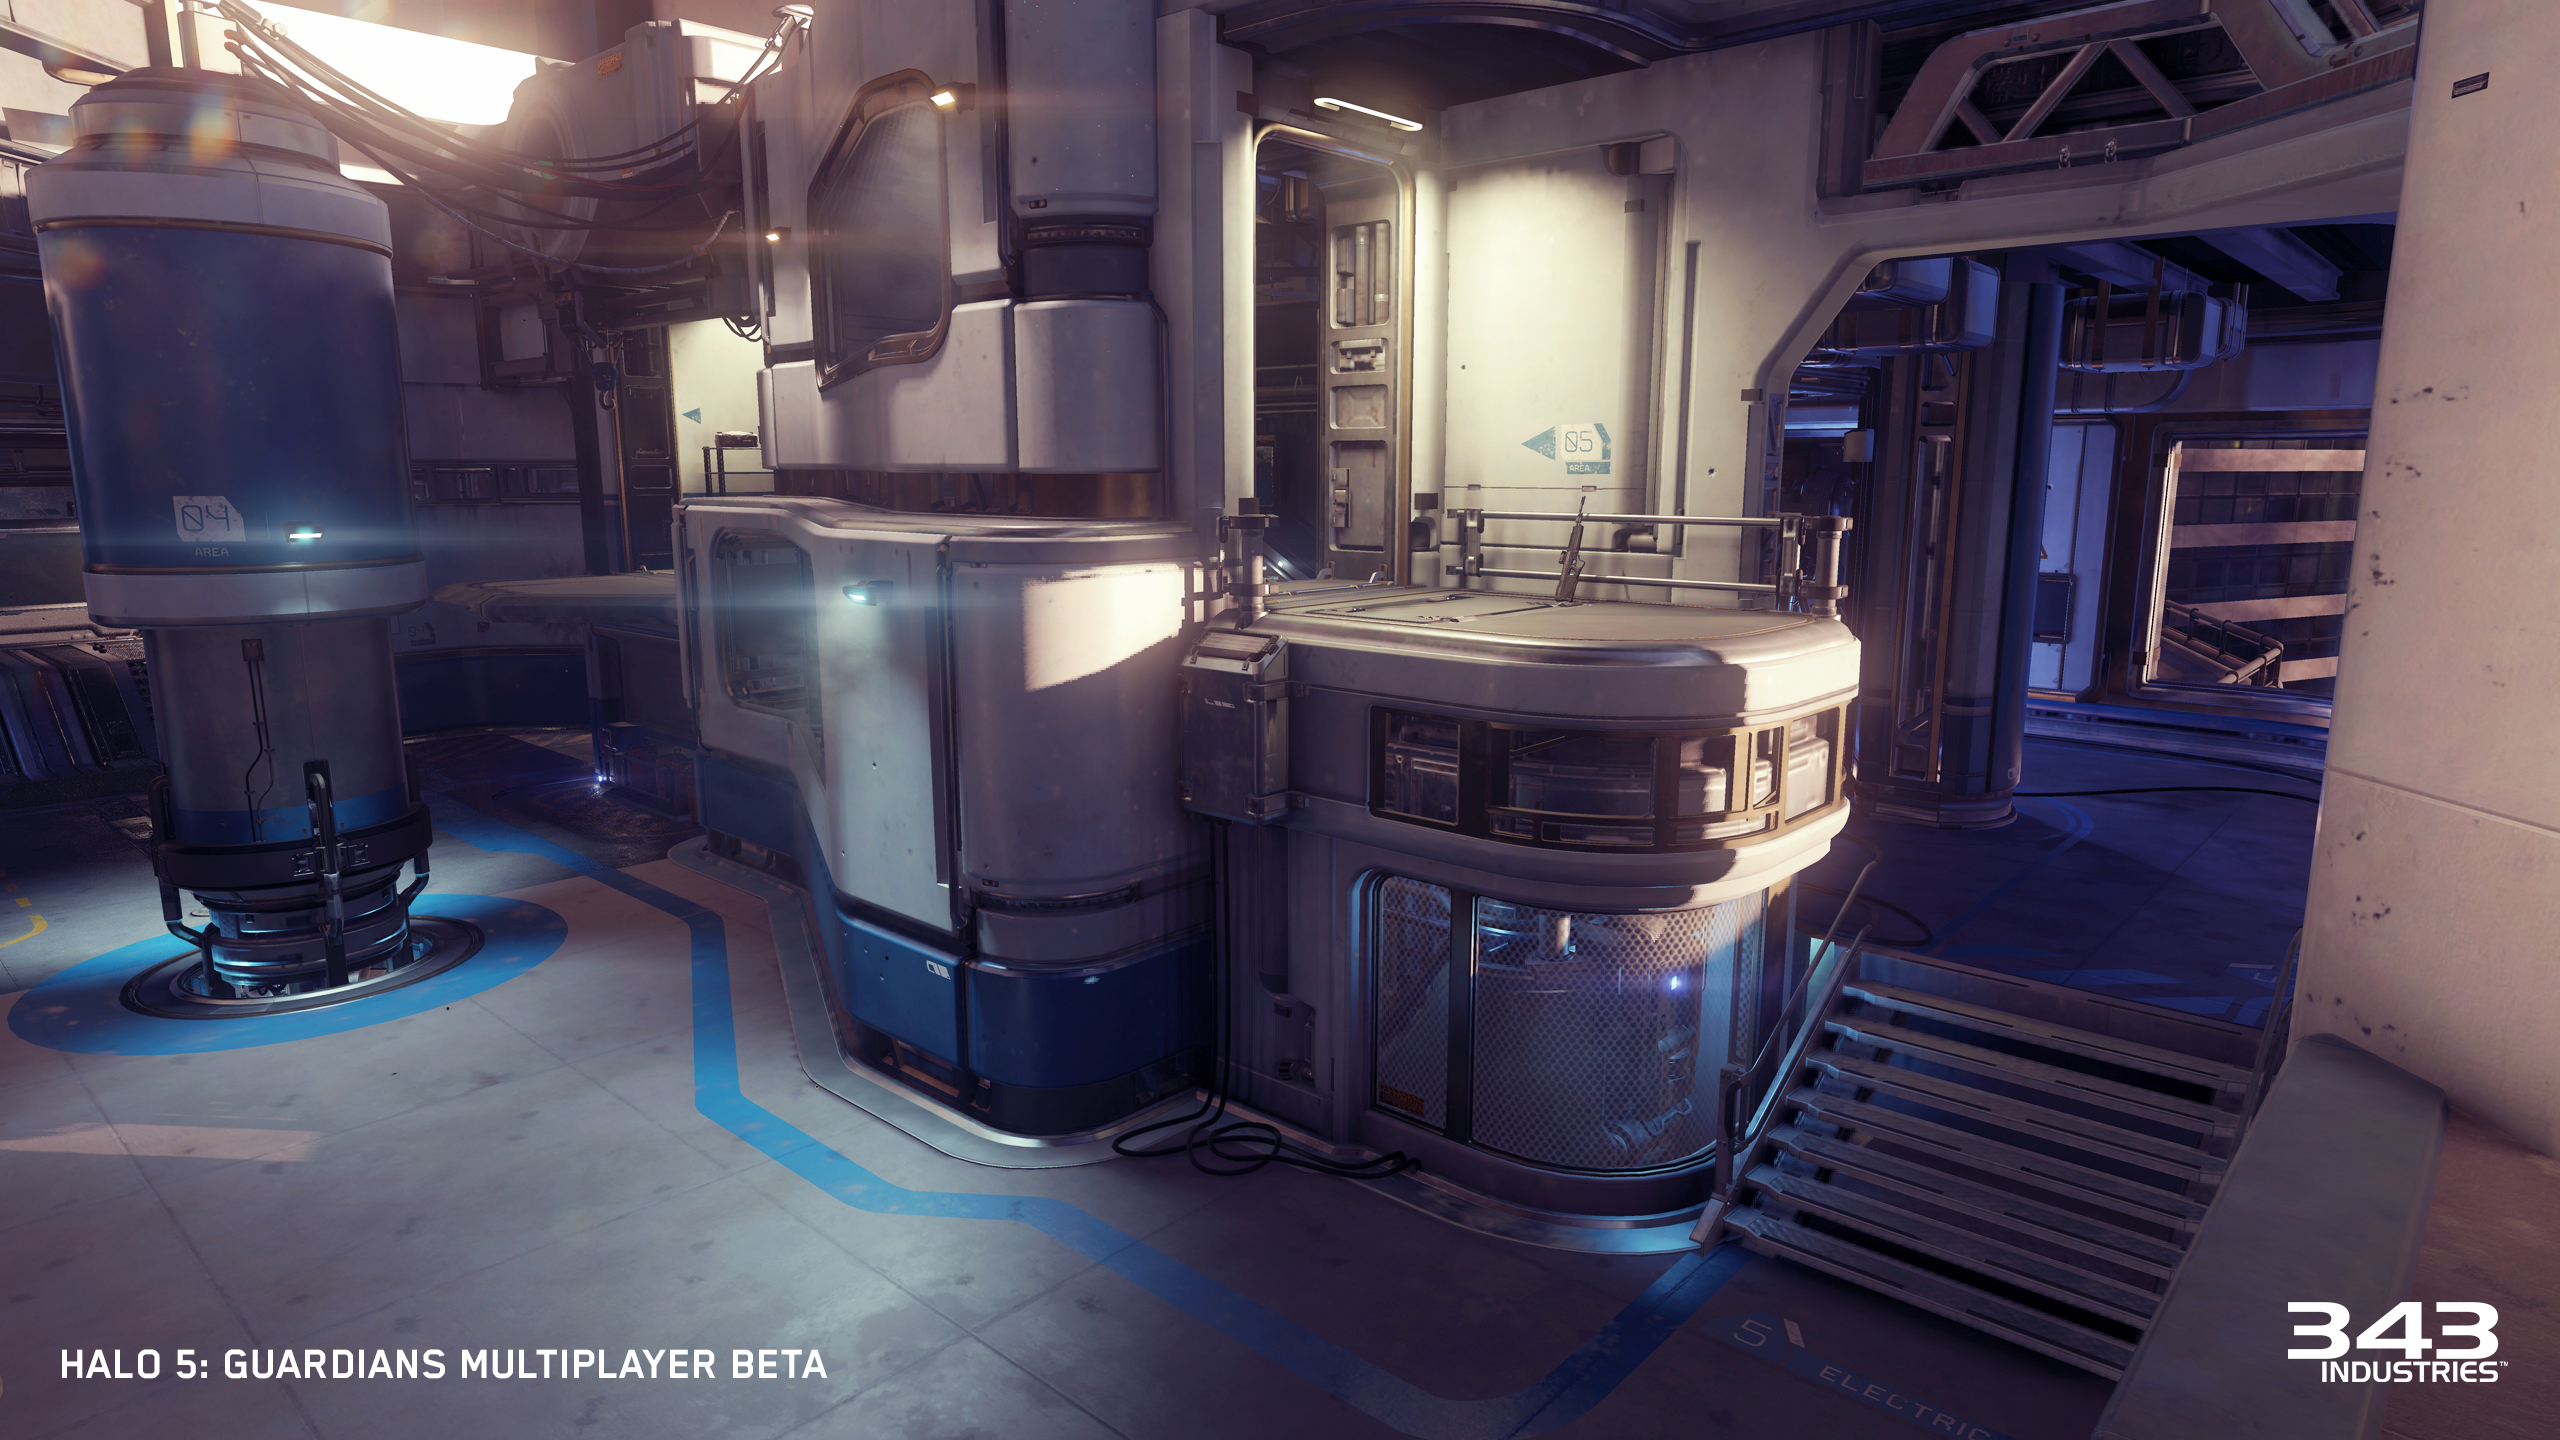 halo  official images multiplayer maps empire and fathom  - the beta designhguardiansempireestablishingelectricalbetacomparison